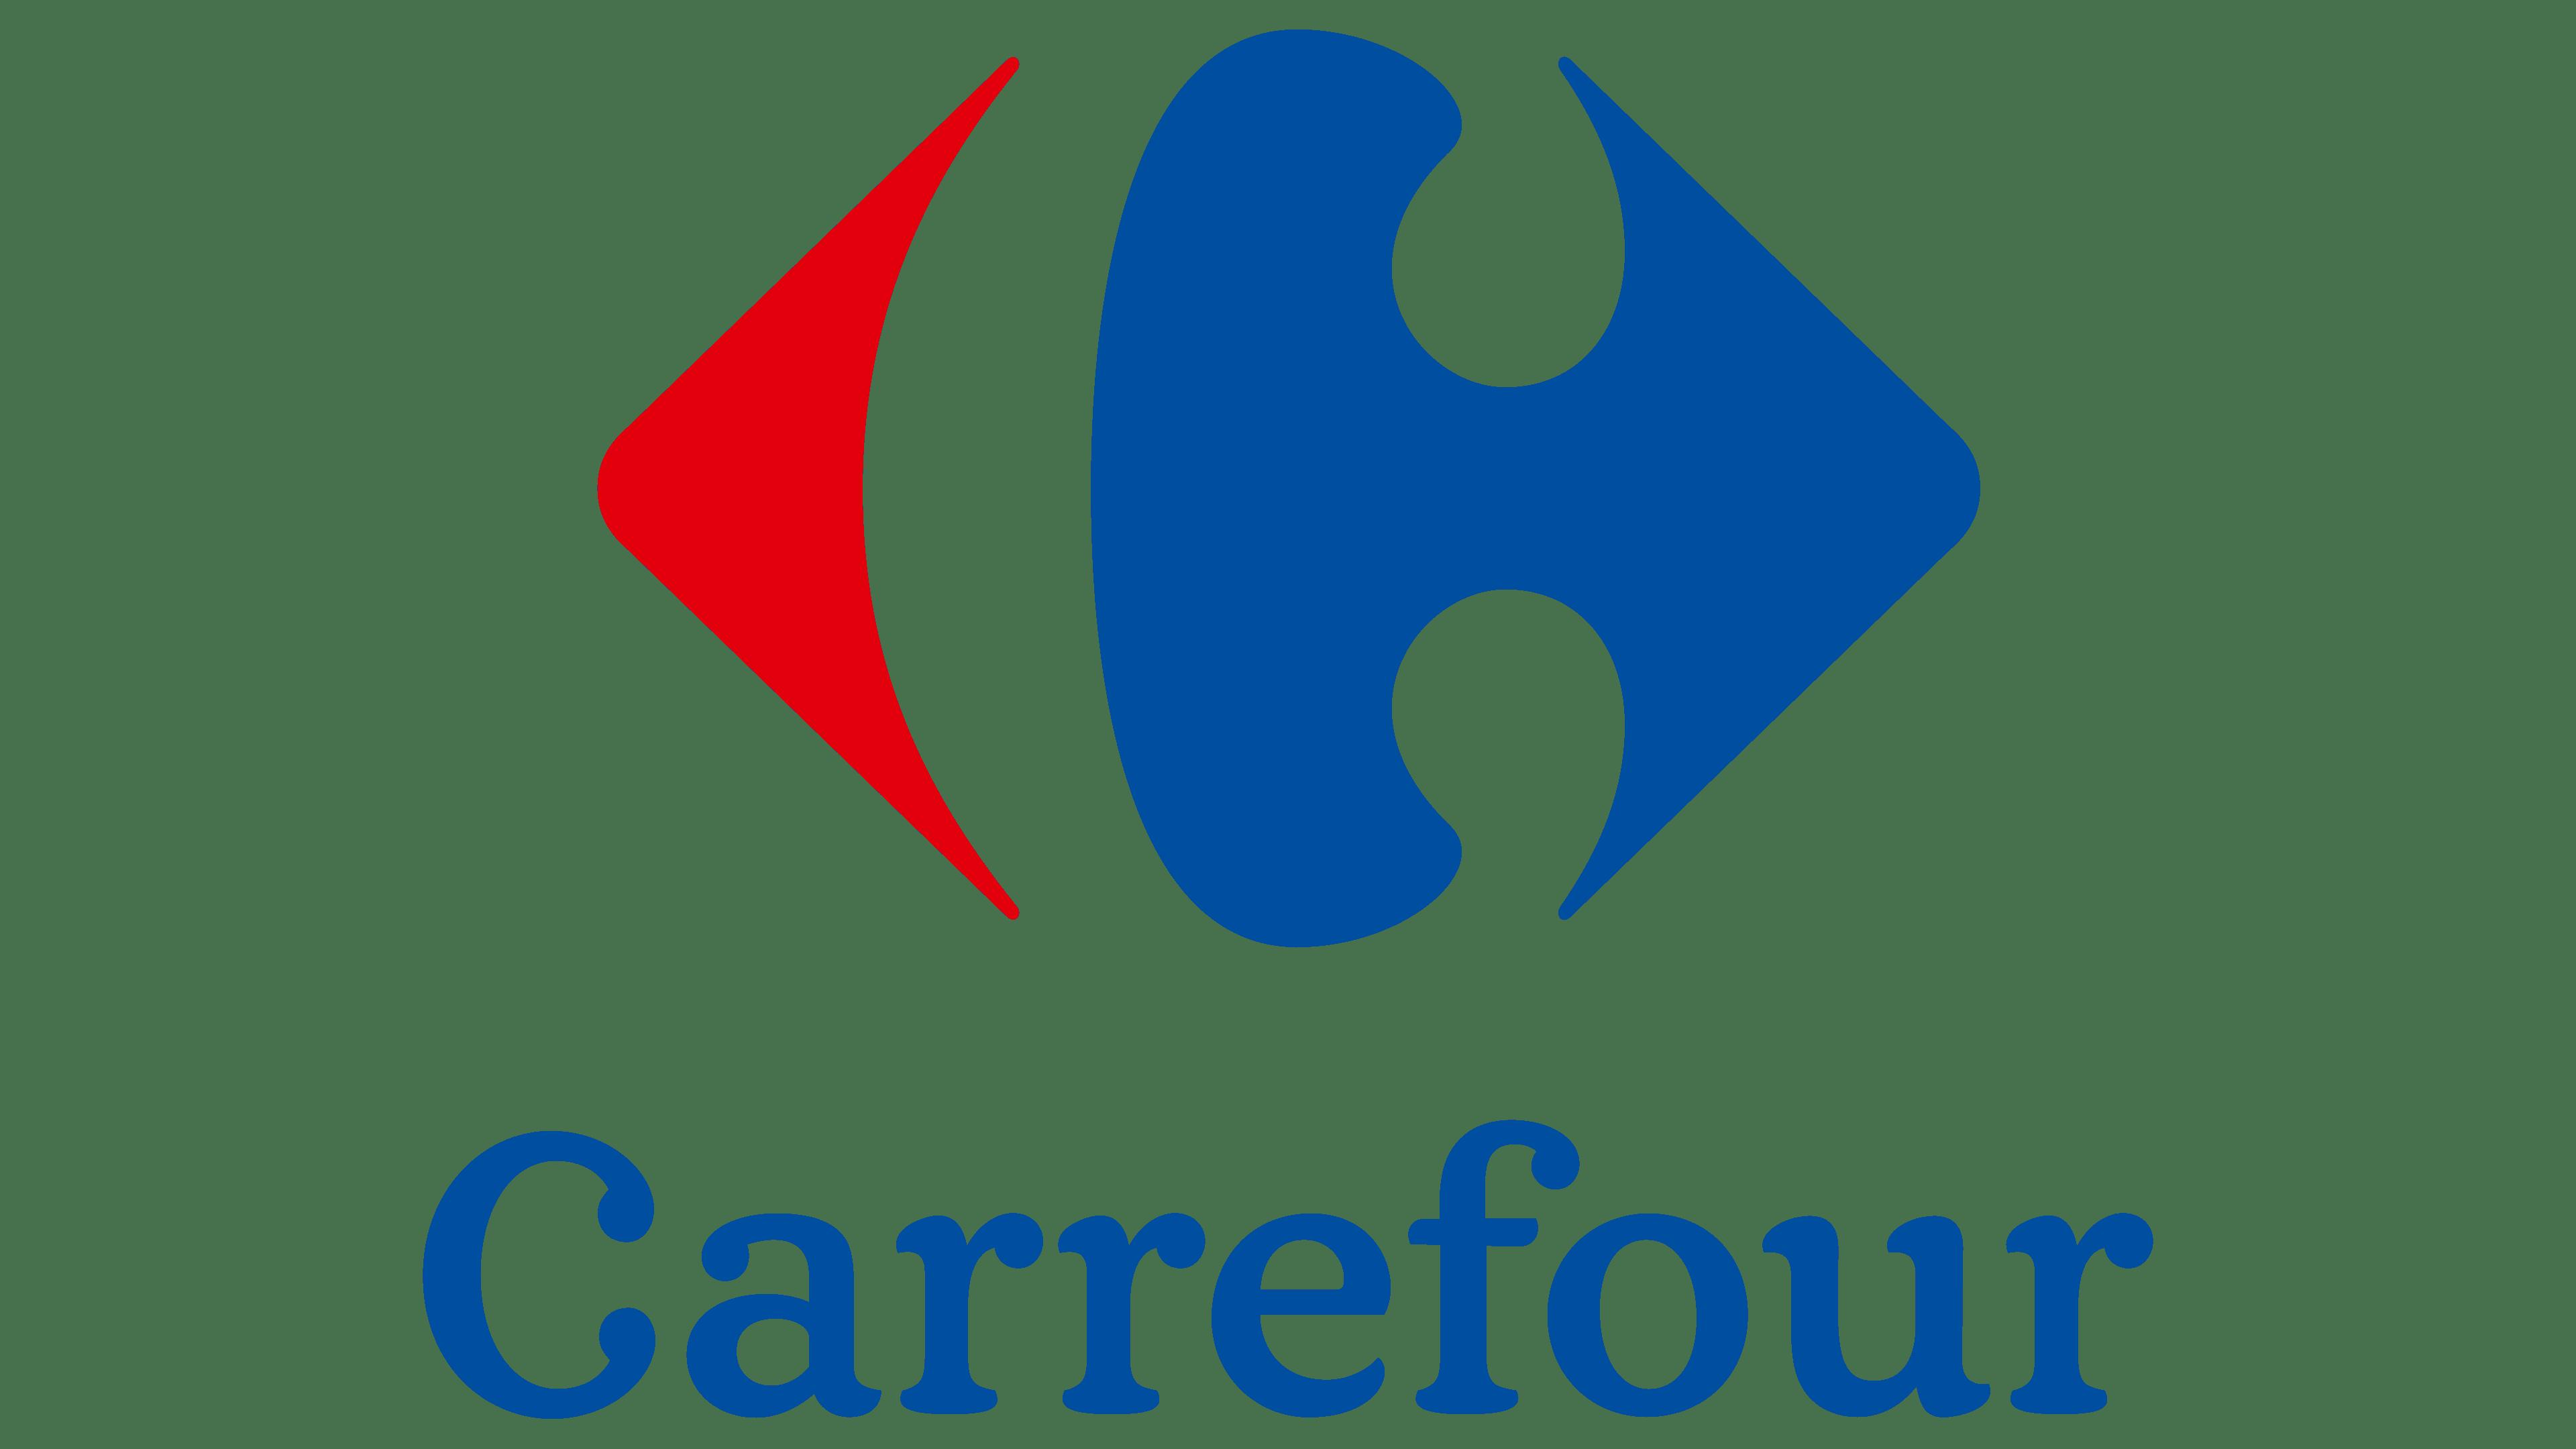 Llévate 20€ de Dto en tu primera compra online en Carrefour